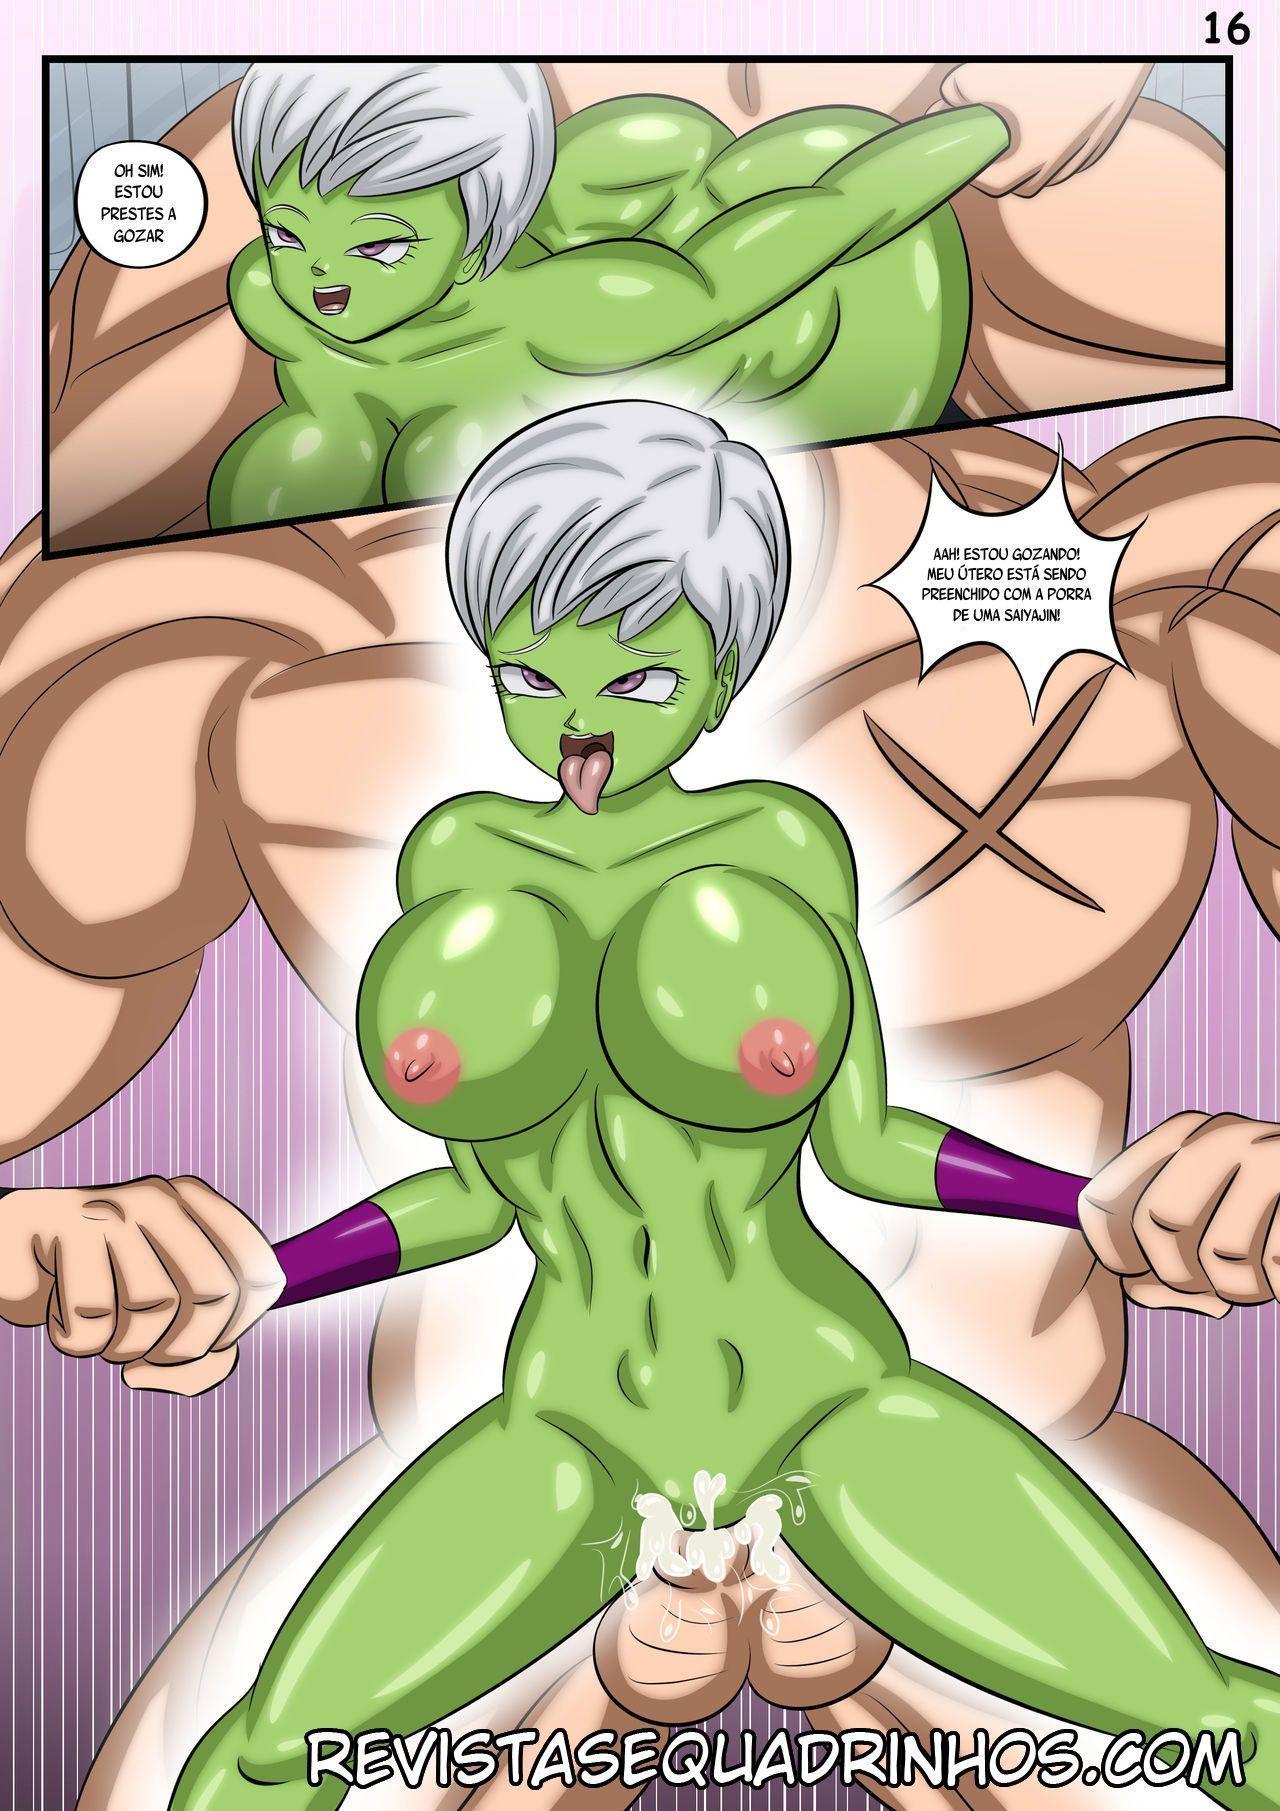 Um ménage com à Bulma